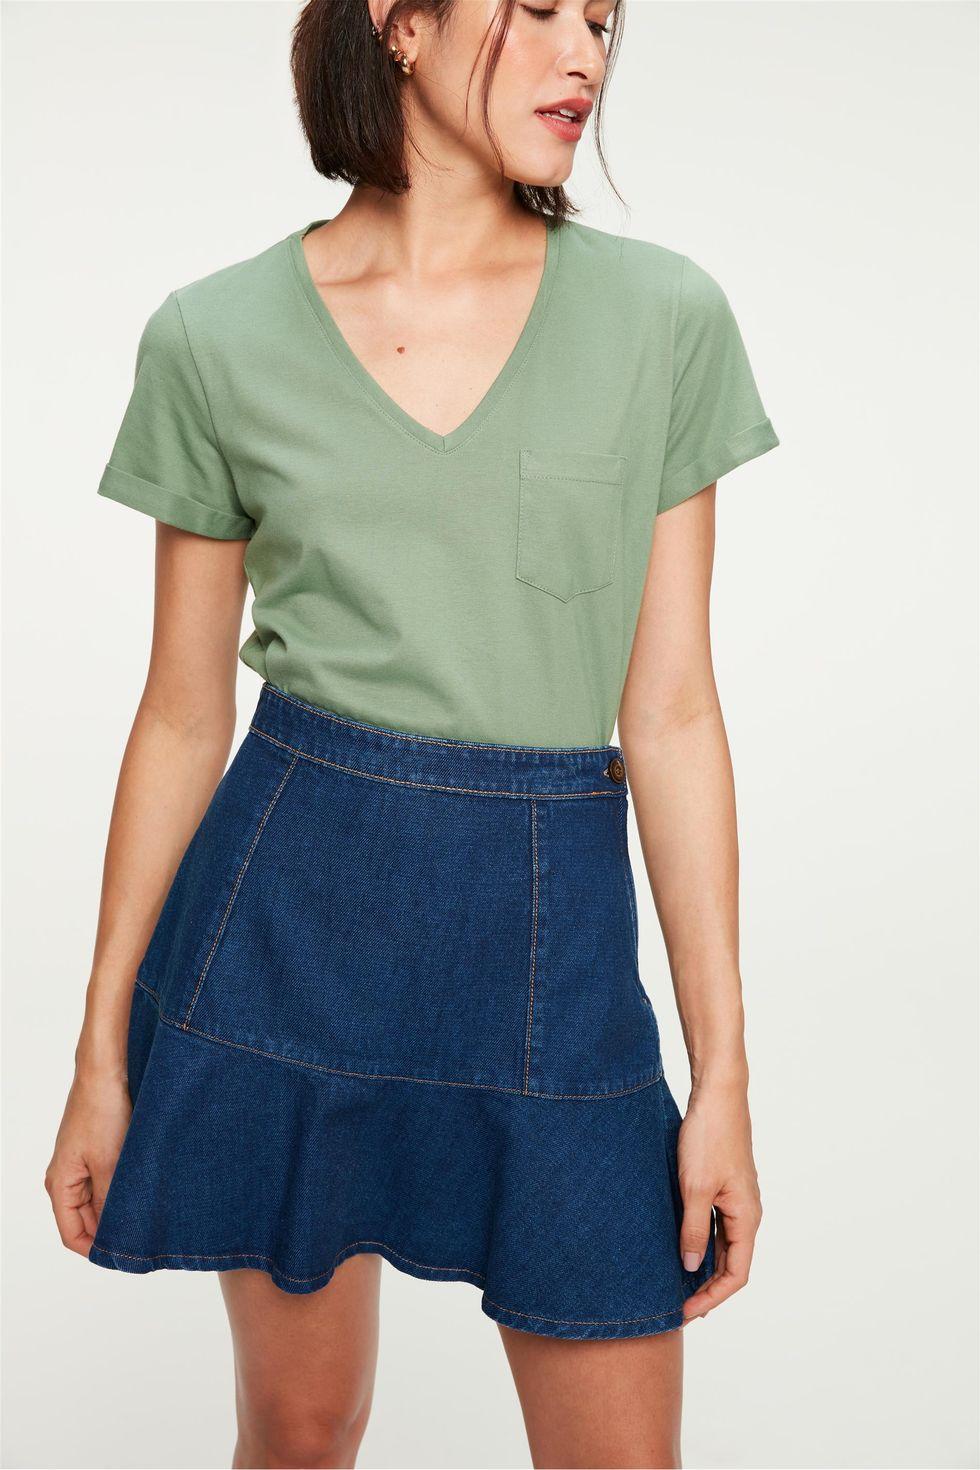 Saia-Jeans-Mini-Peplum-com-Recortes-Frente--